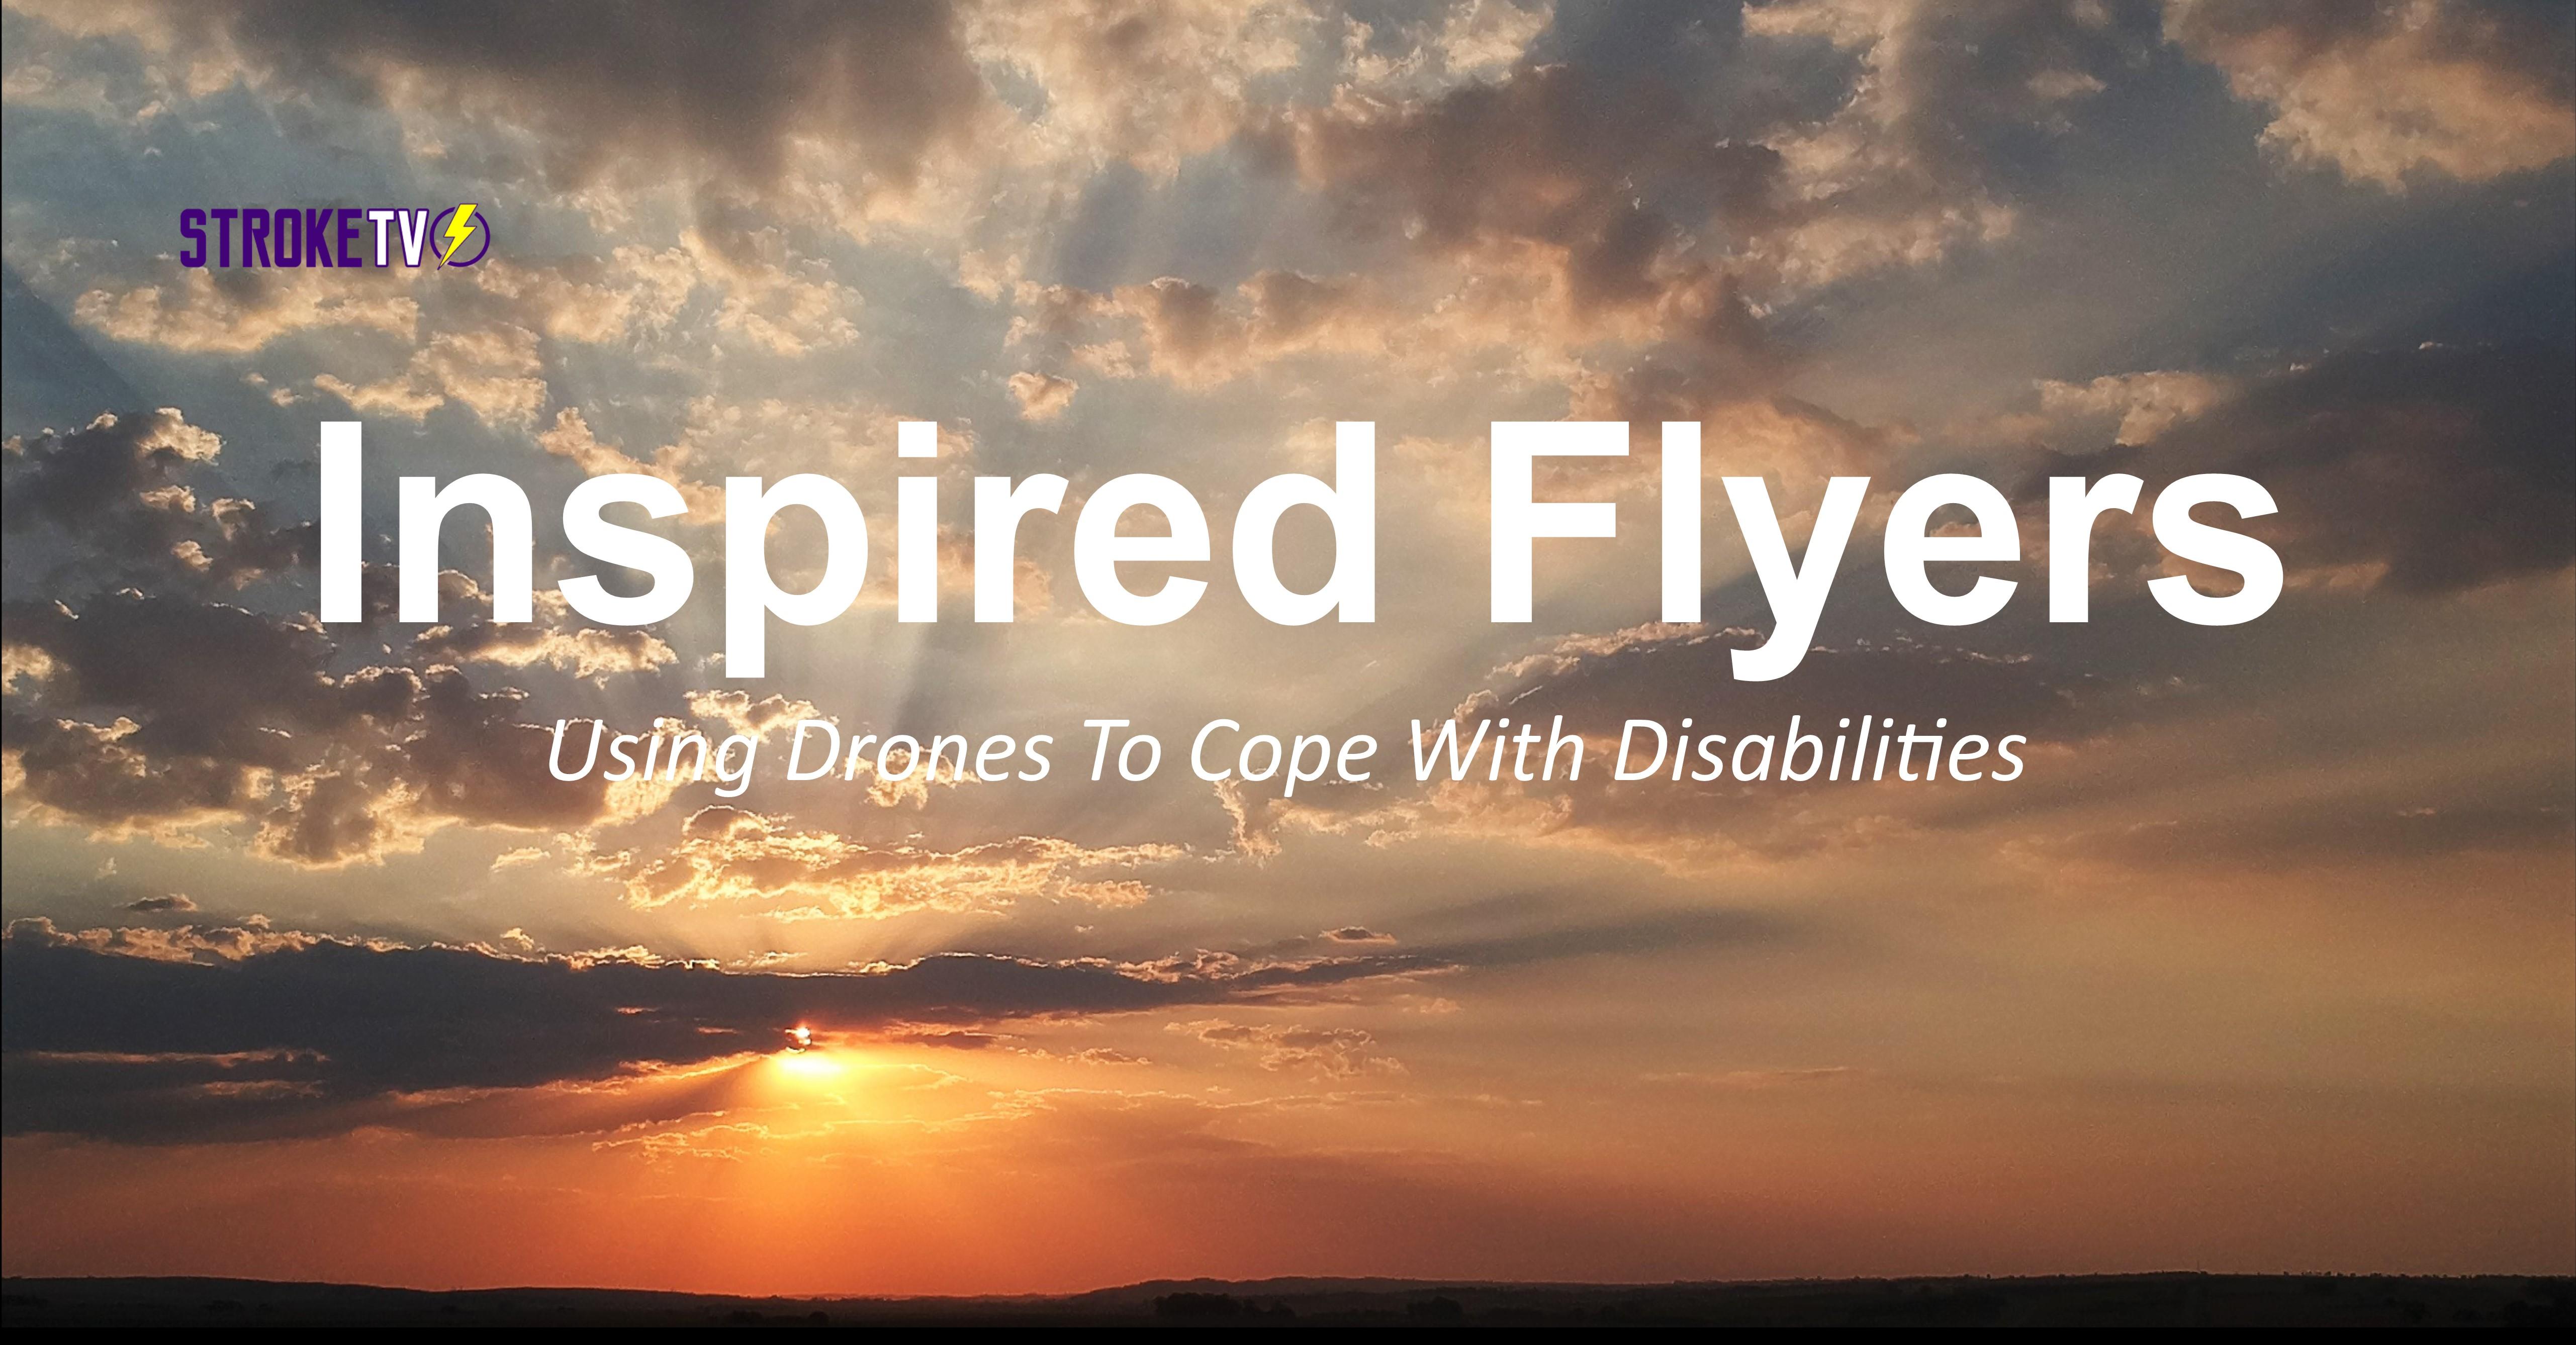 InspiredFlyers.jpg